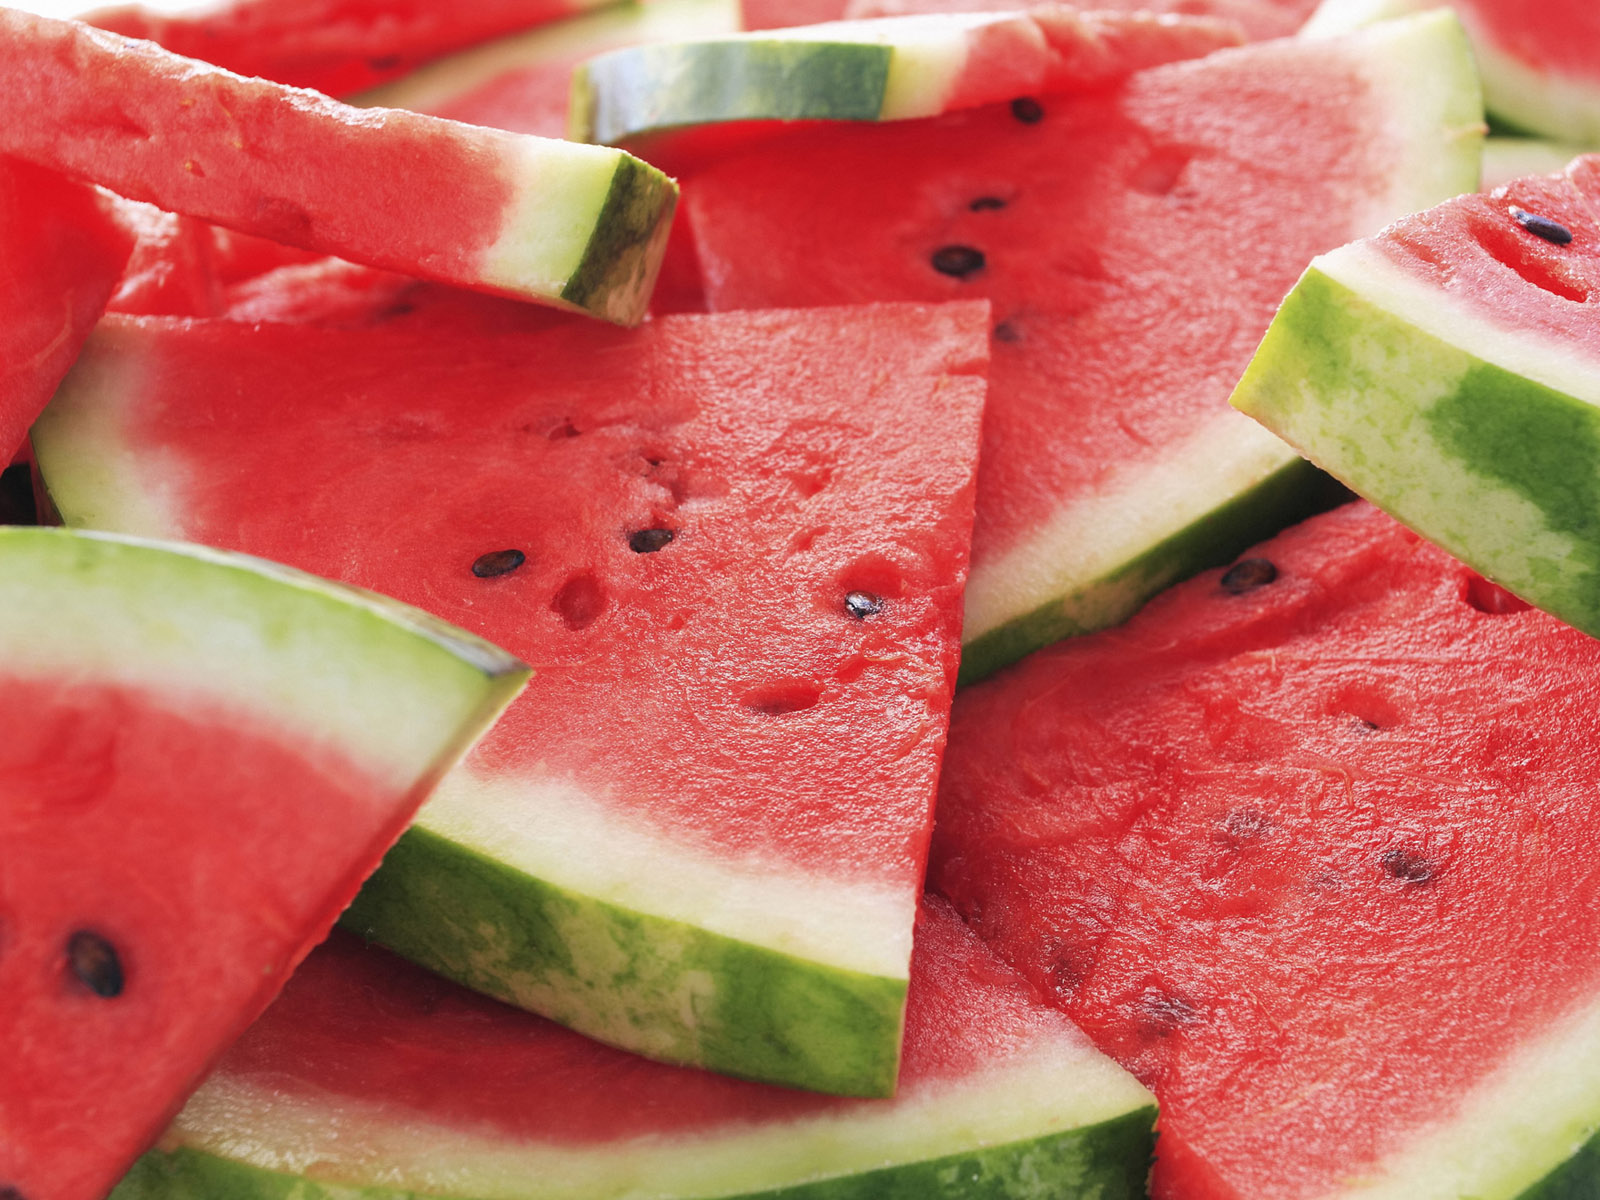 http://2.bp.blogspot.com/-y6fIQV2iOFg/UGhvvNGMQAI/AAAAAAAACLU/nSl0dQ8TpuY/s1600/juicy_watermelon_wallpaper.jpg